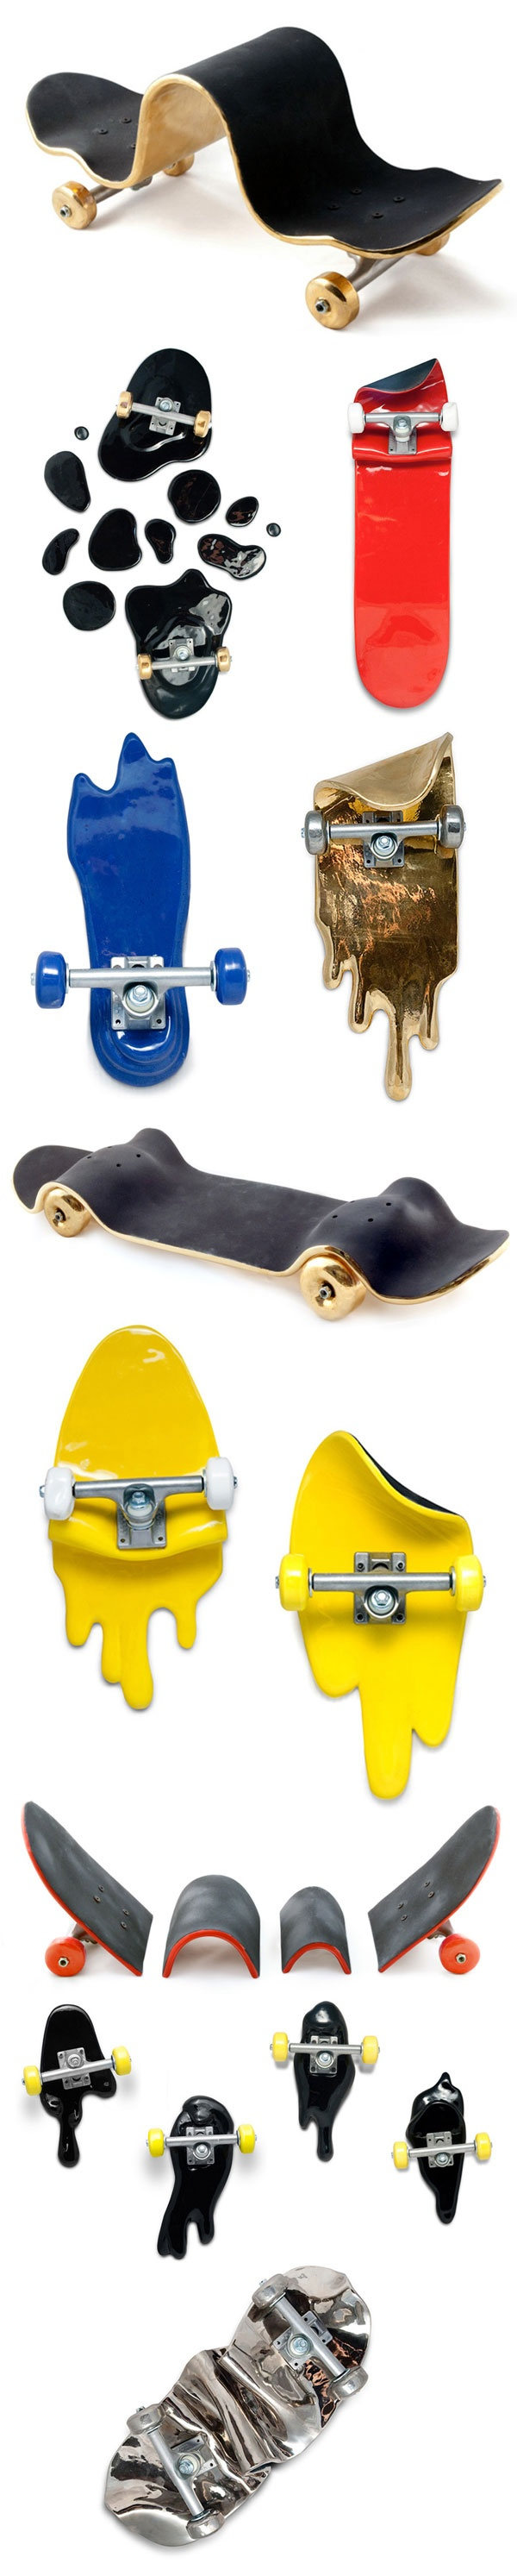 Skateboard clip art images skateboard stock photos amp clipart - Apparatu X Alex Trochut Skate Fails